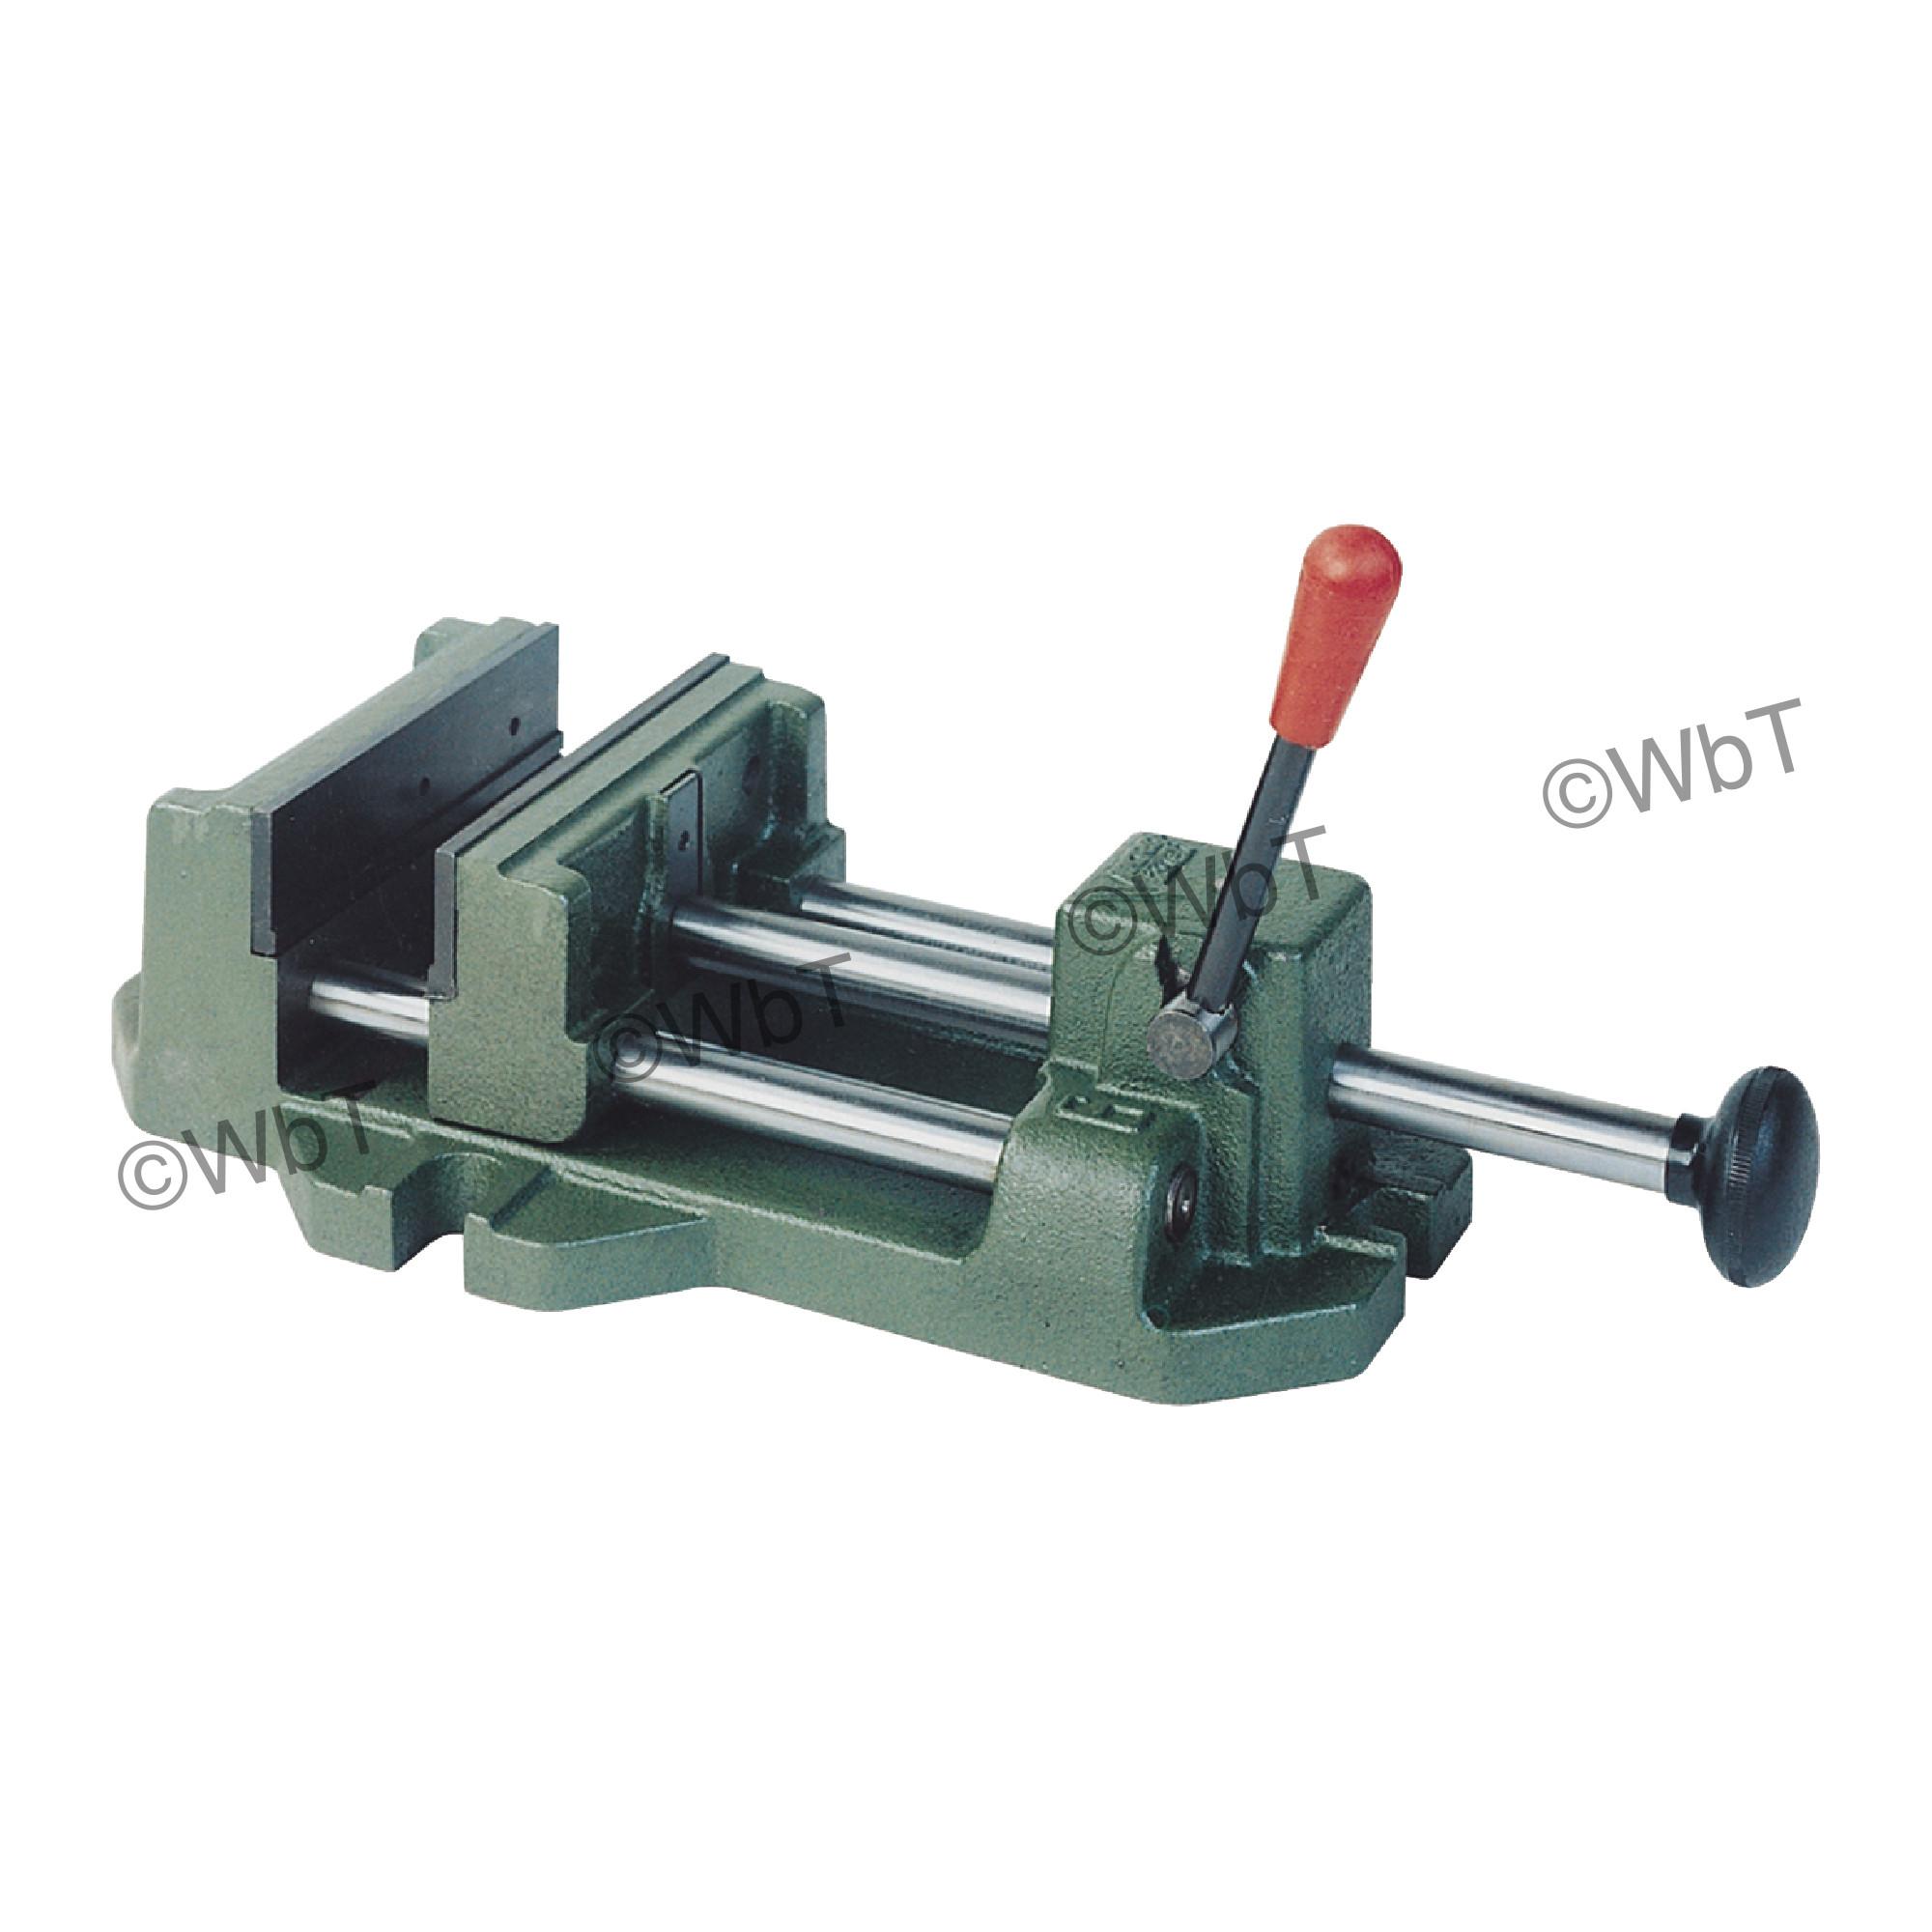 Quick Set Drill Press Vise